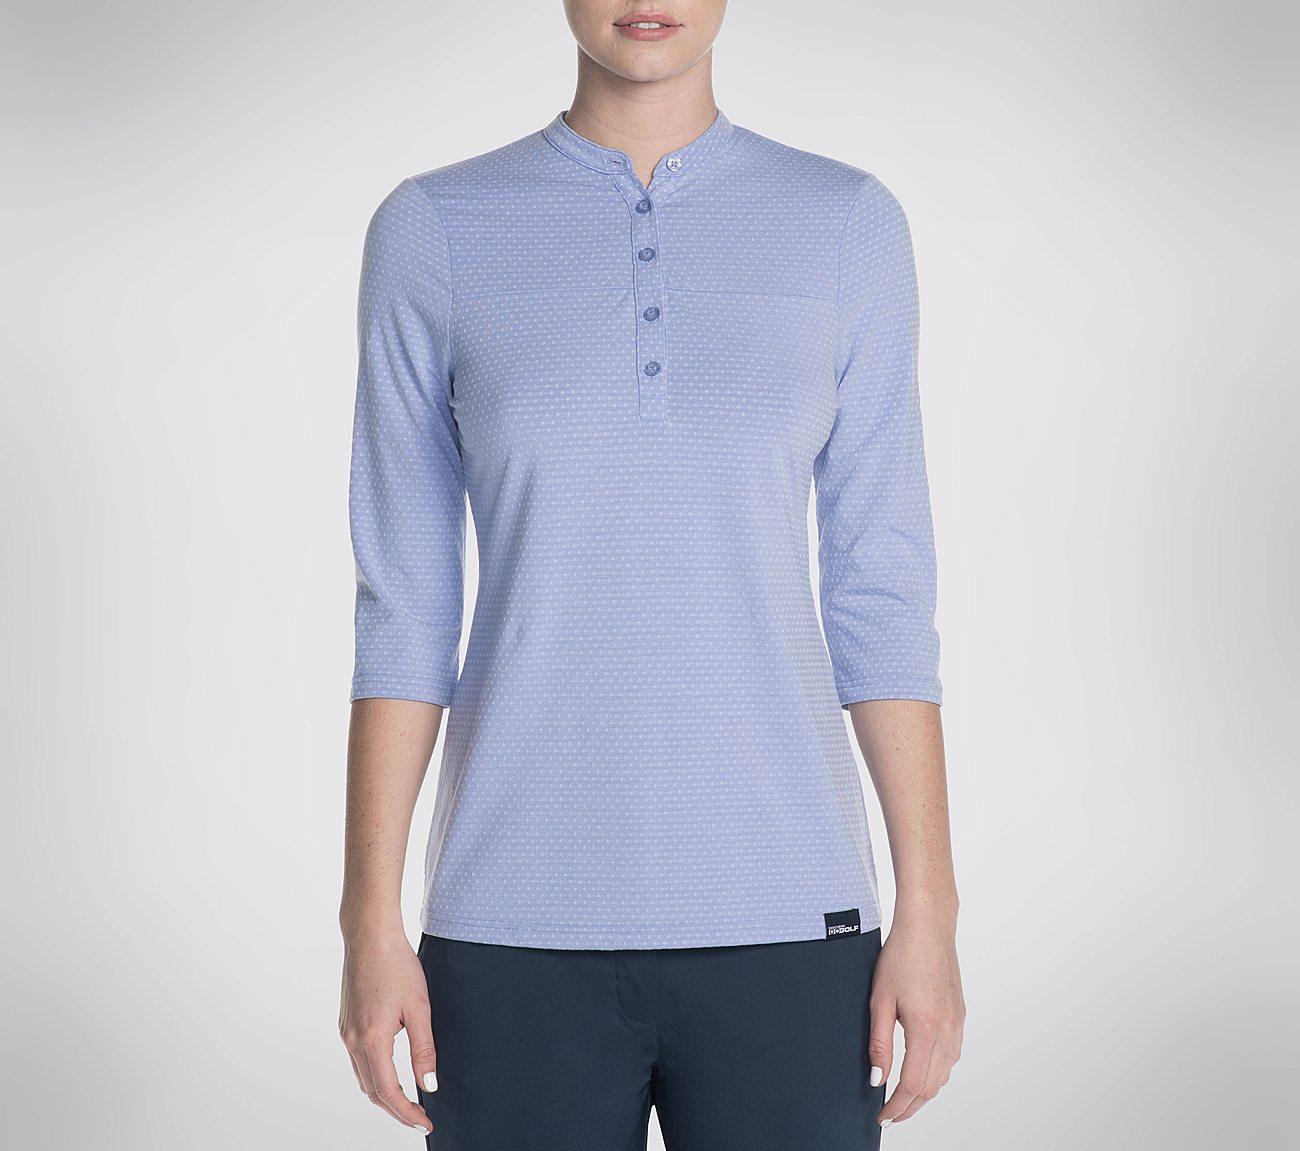 Skechers GO GOLF Birdseye Mid Sleeve Polo Shirt